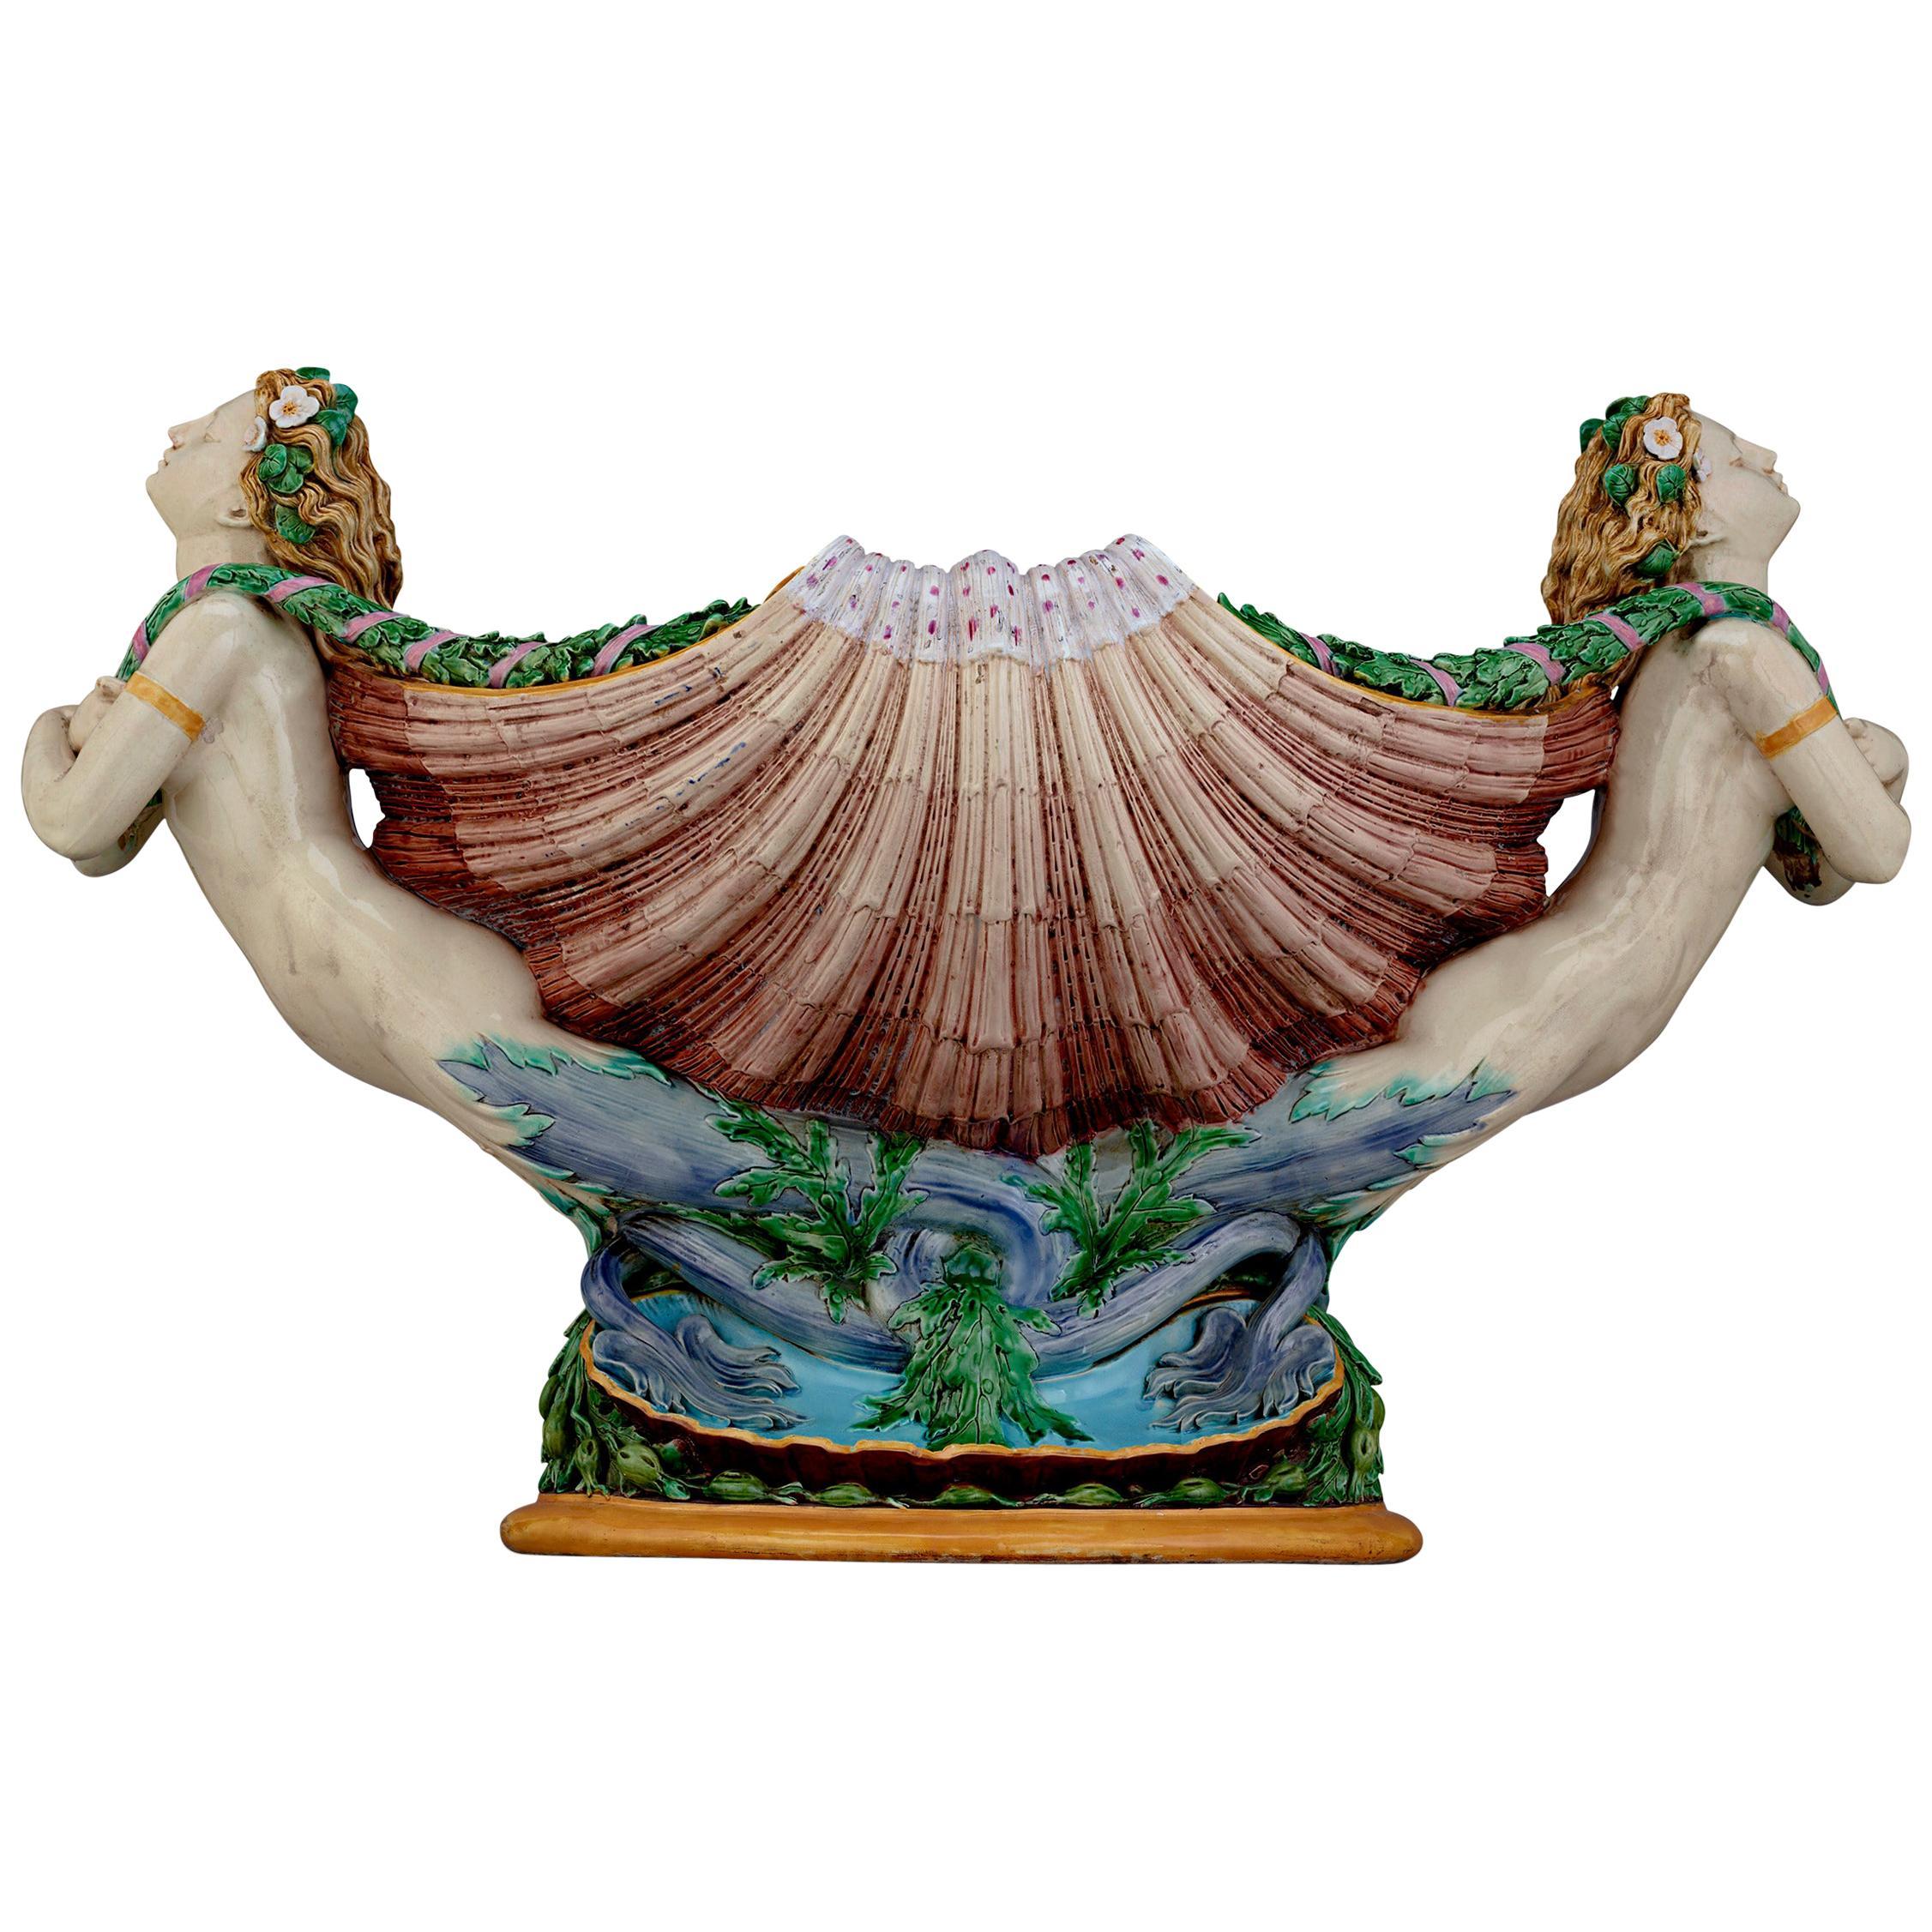 Majolica Mermaids Jardinière by Minton